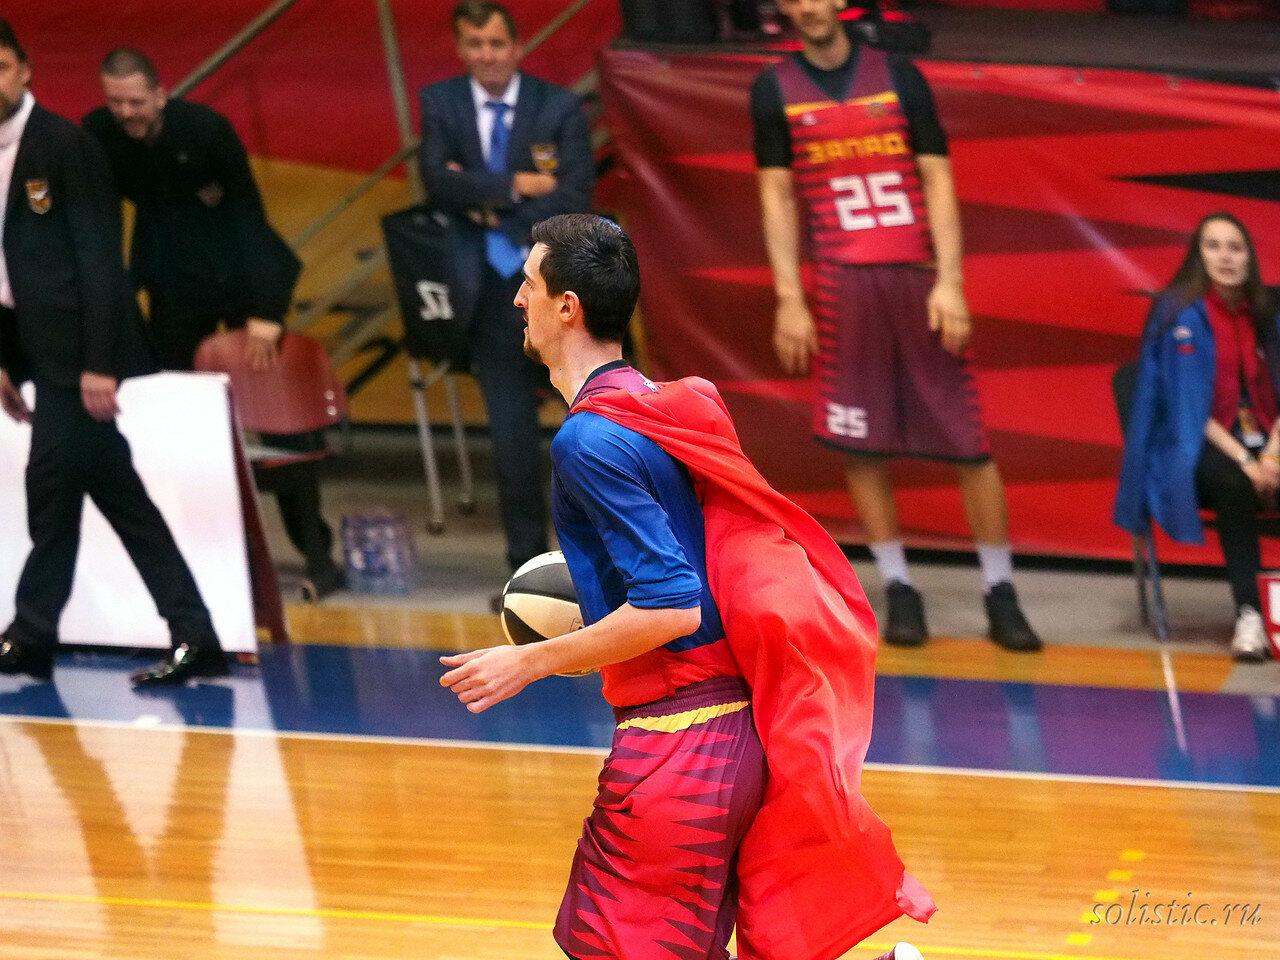 86 Матч звезд АСБ 2018 (ассоциации студенческого баскетбола)